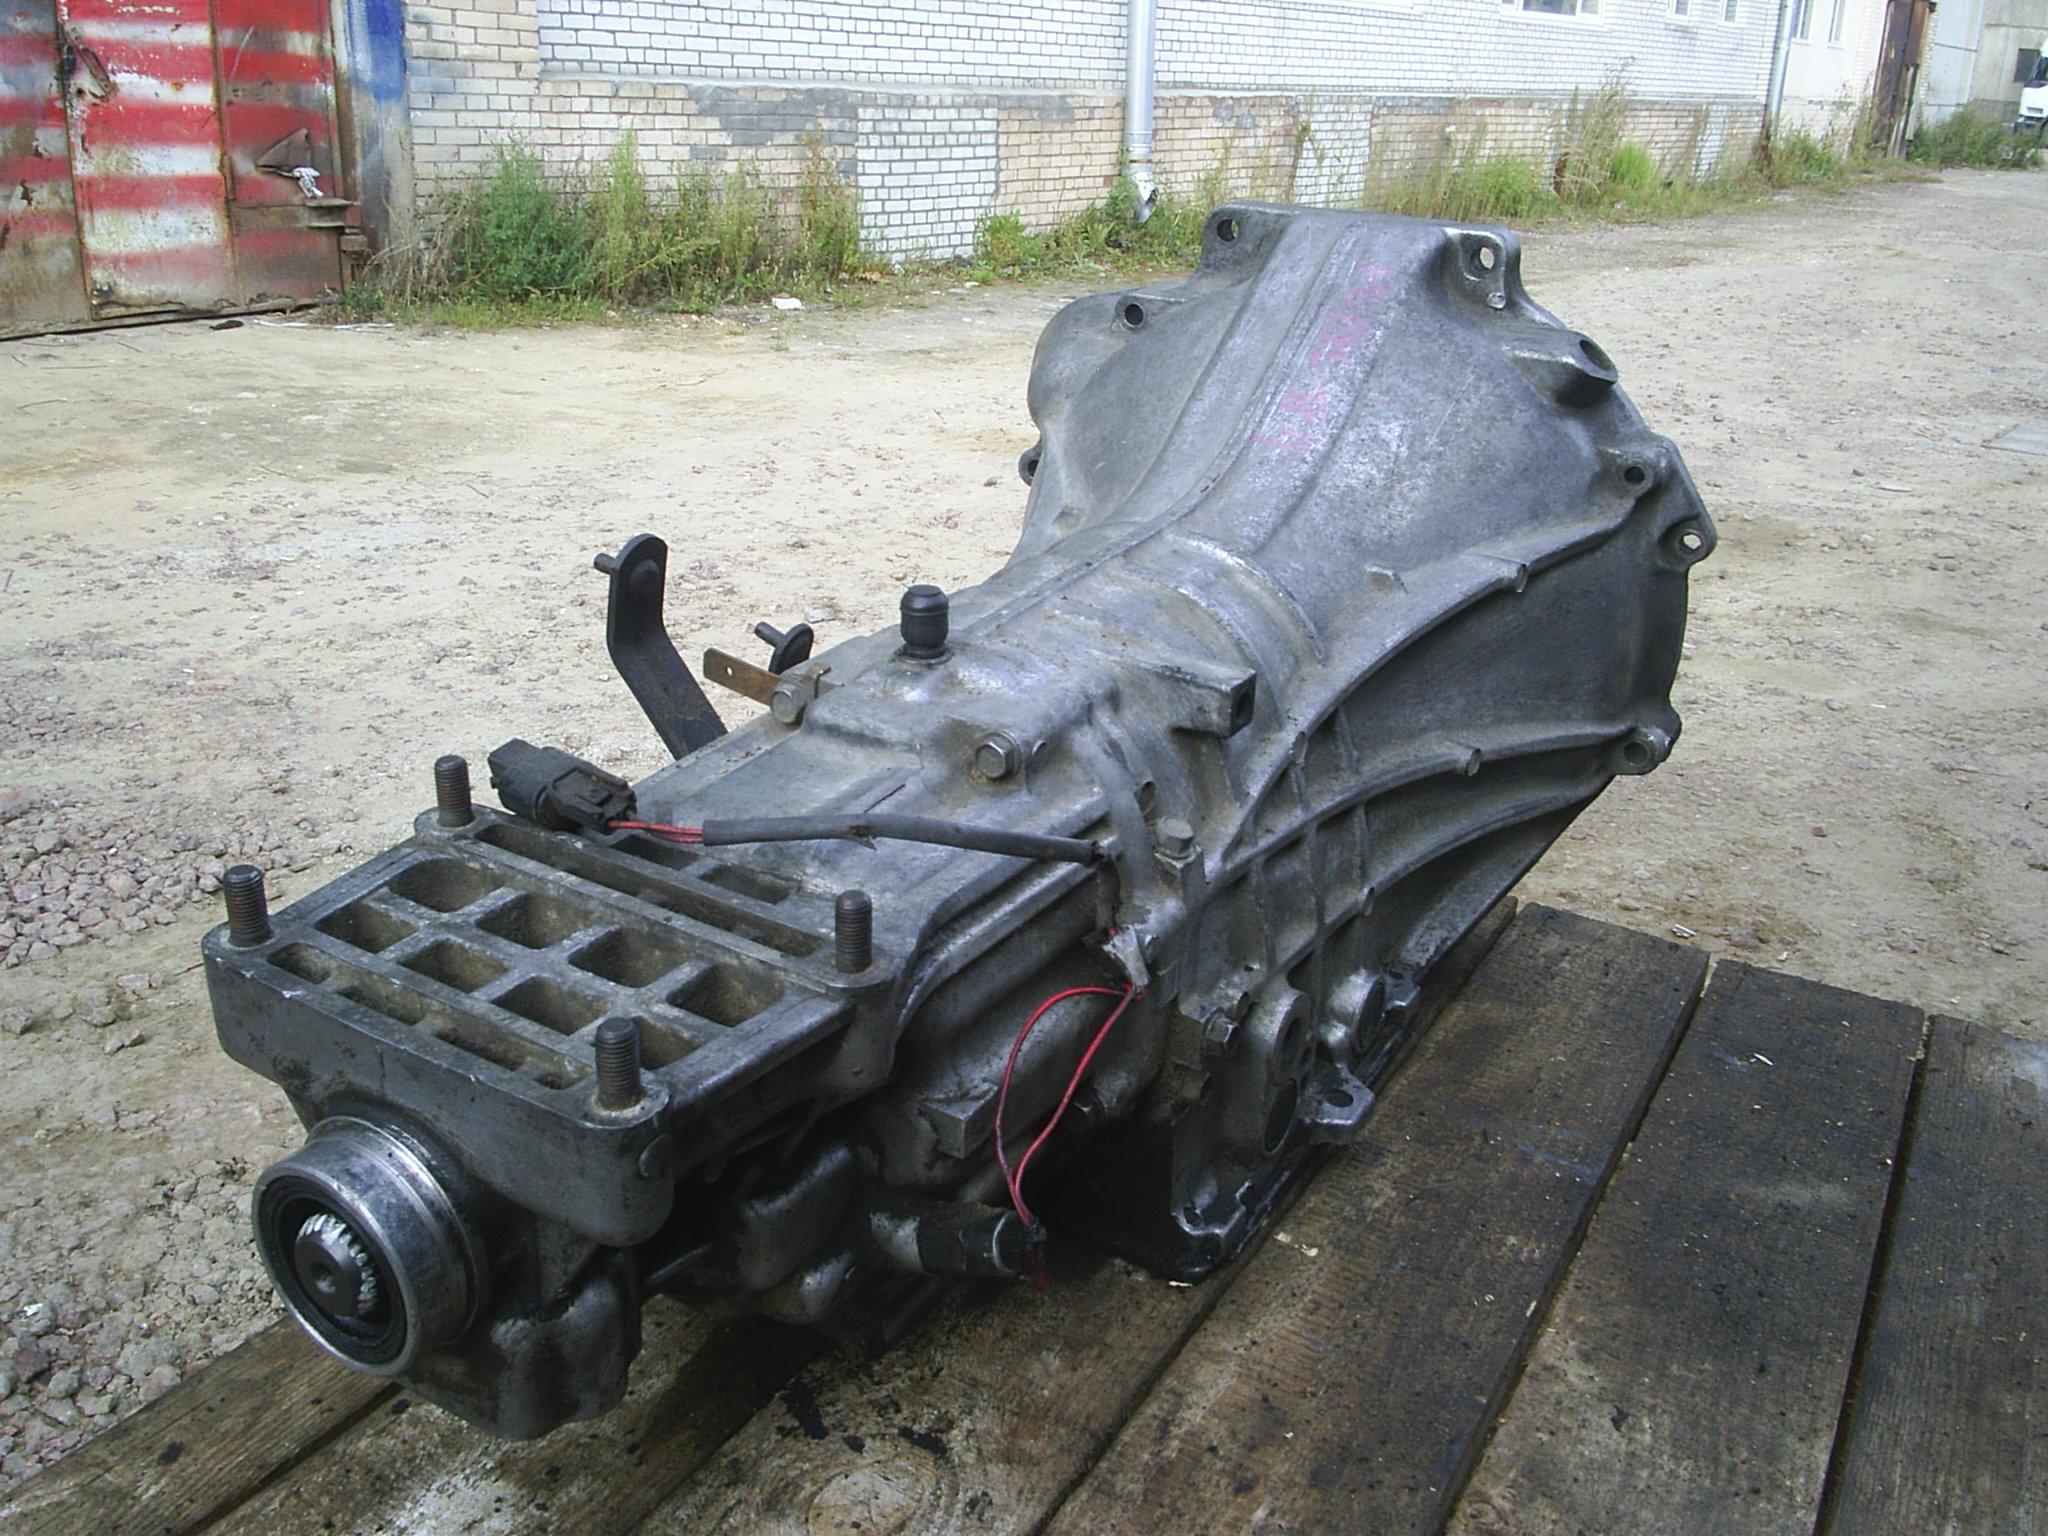 Купить МКПП Механика на Hyundai Porter (Хендэ Портер) Тагаз 430004B200 (43000-4B200), 430004B201 (43000-4B201), 430004B202 (43000-4B202), 430004A116 (43000-4A116), 430004A115 (43000-4A115)